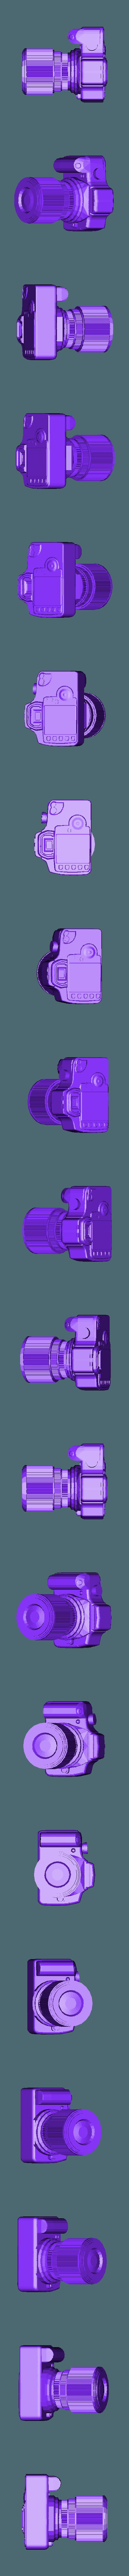 Canon350DbasicbyALX_fixed.stl Download free STL file Canon EOS 350D model • 3D printer template, Aralala